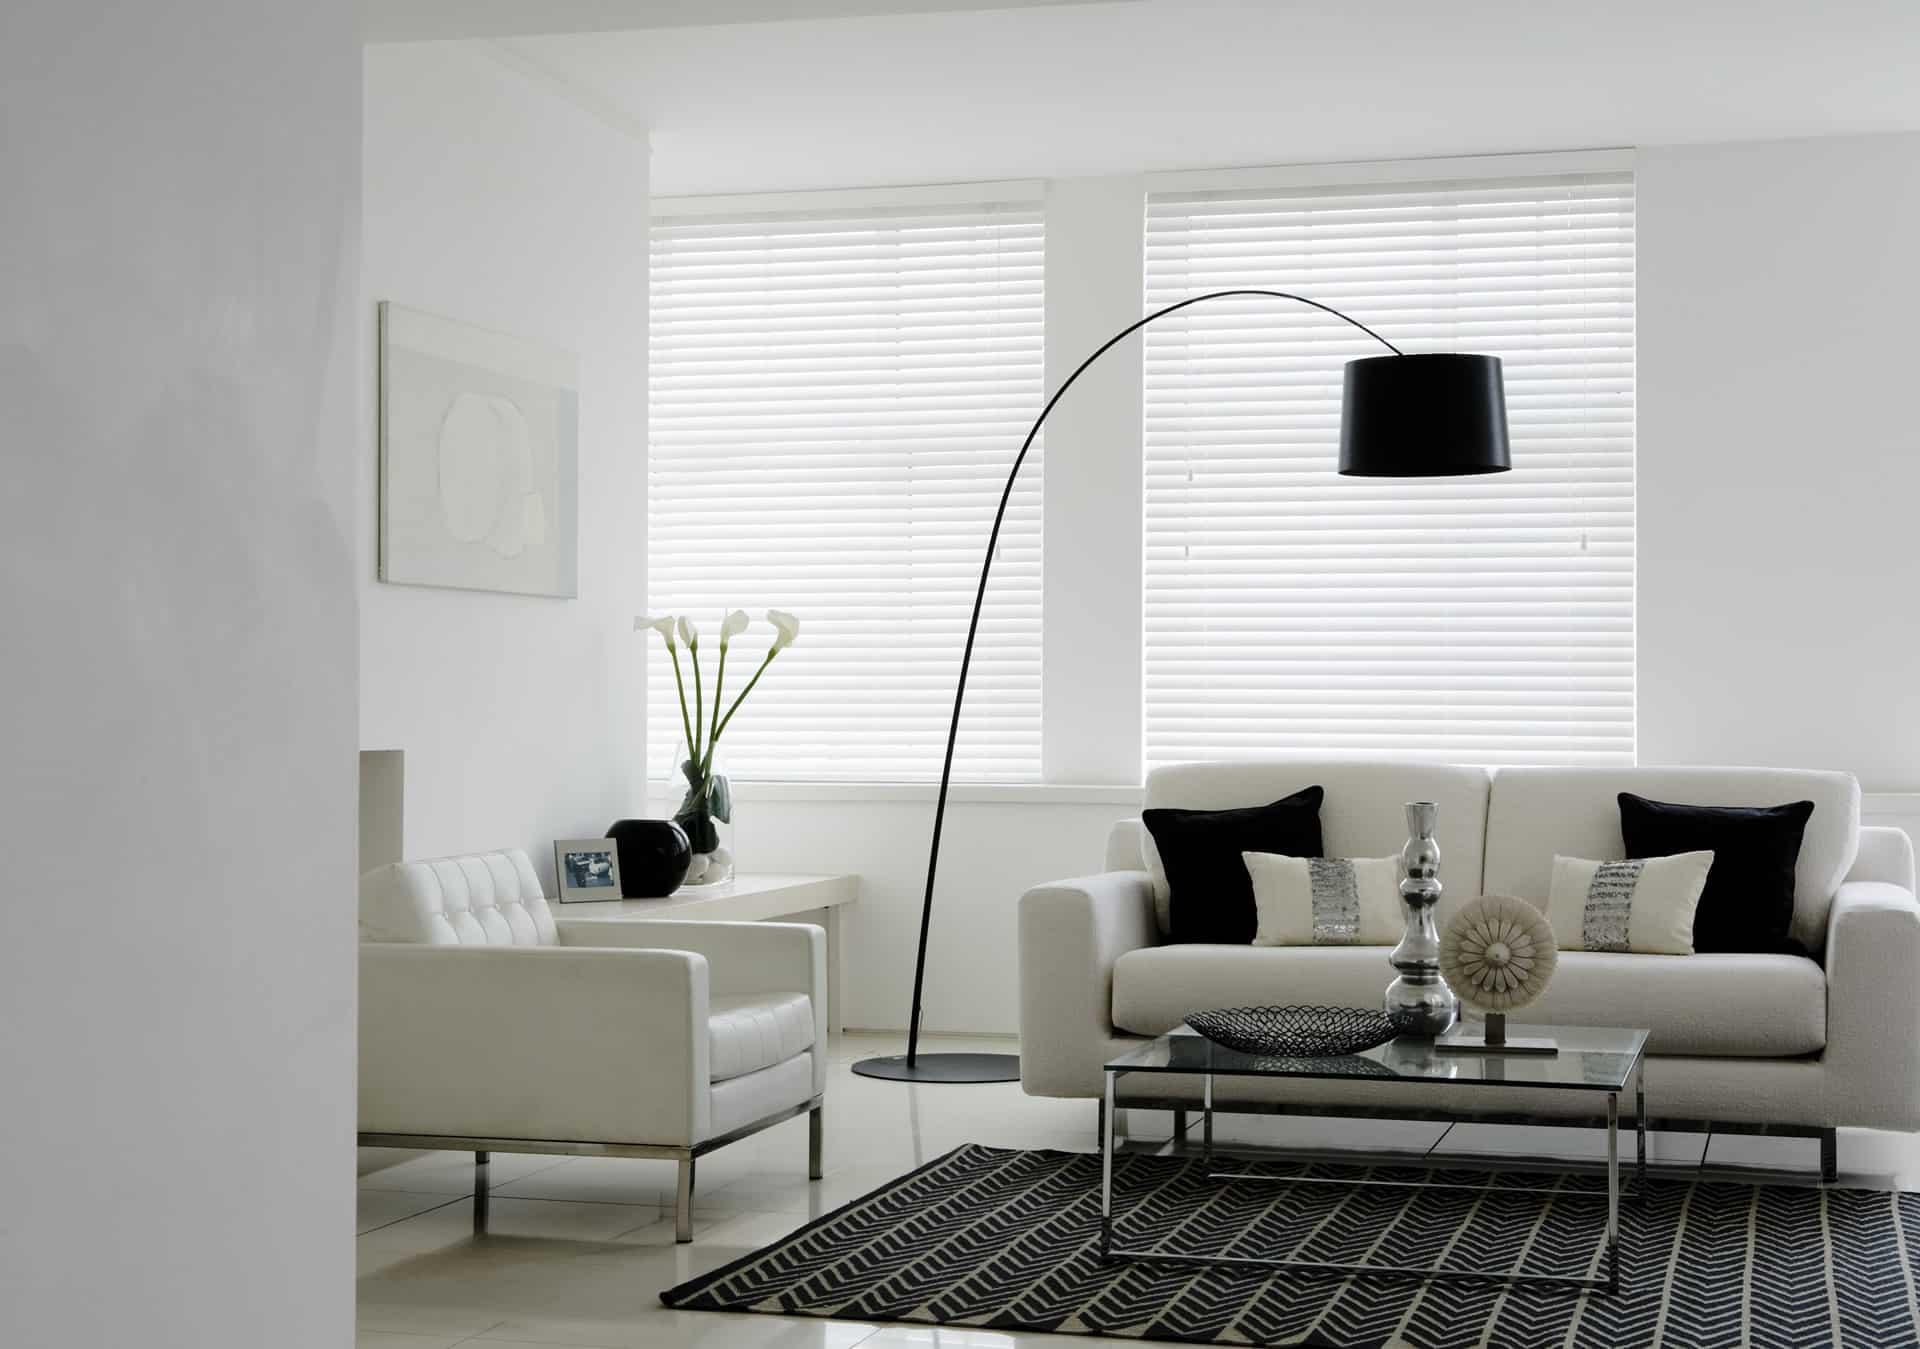 Fauz wooden blinds Newcastle